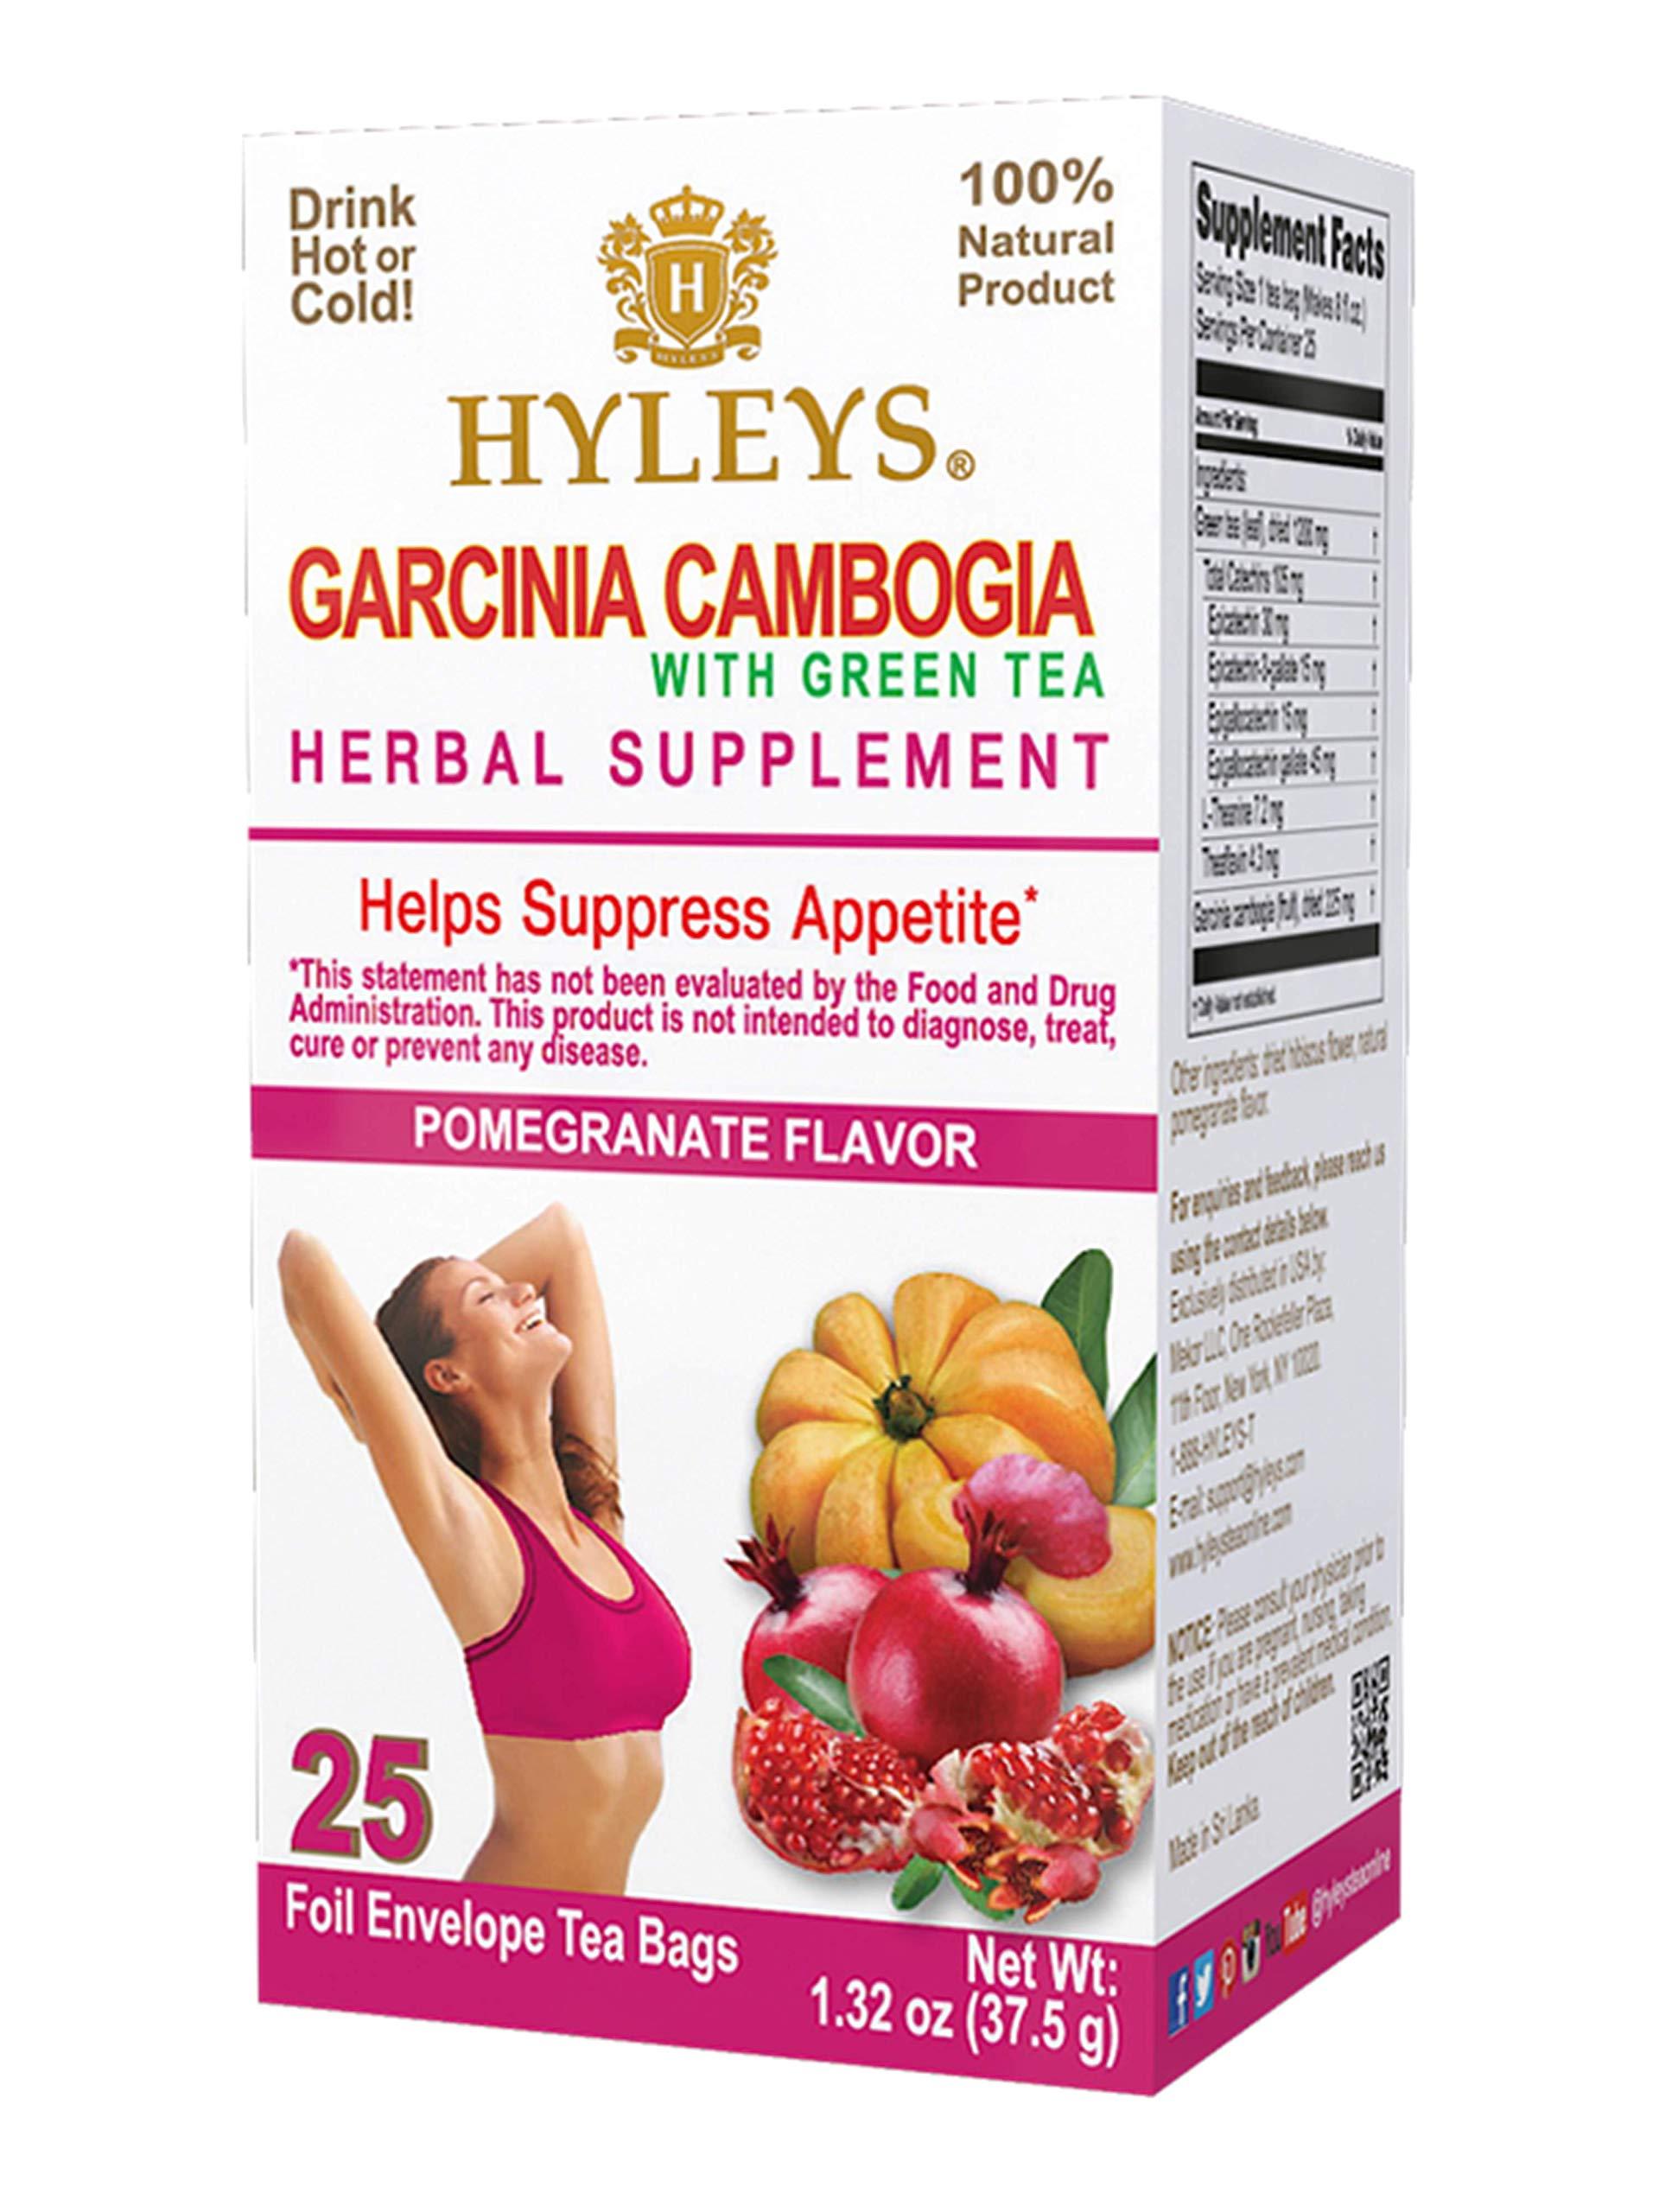 HYLEYS Tea Wellness Garcinia Cambogia Green Tea Pomegranate - 25 bags (100% Natural, Sugar Free, Gluten Free and Non GMO), Pomegranate, 25.0 Count